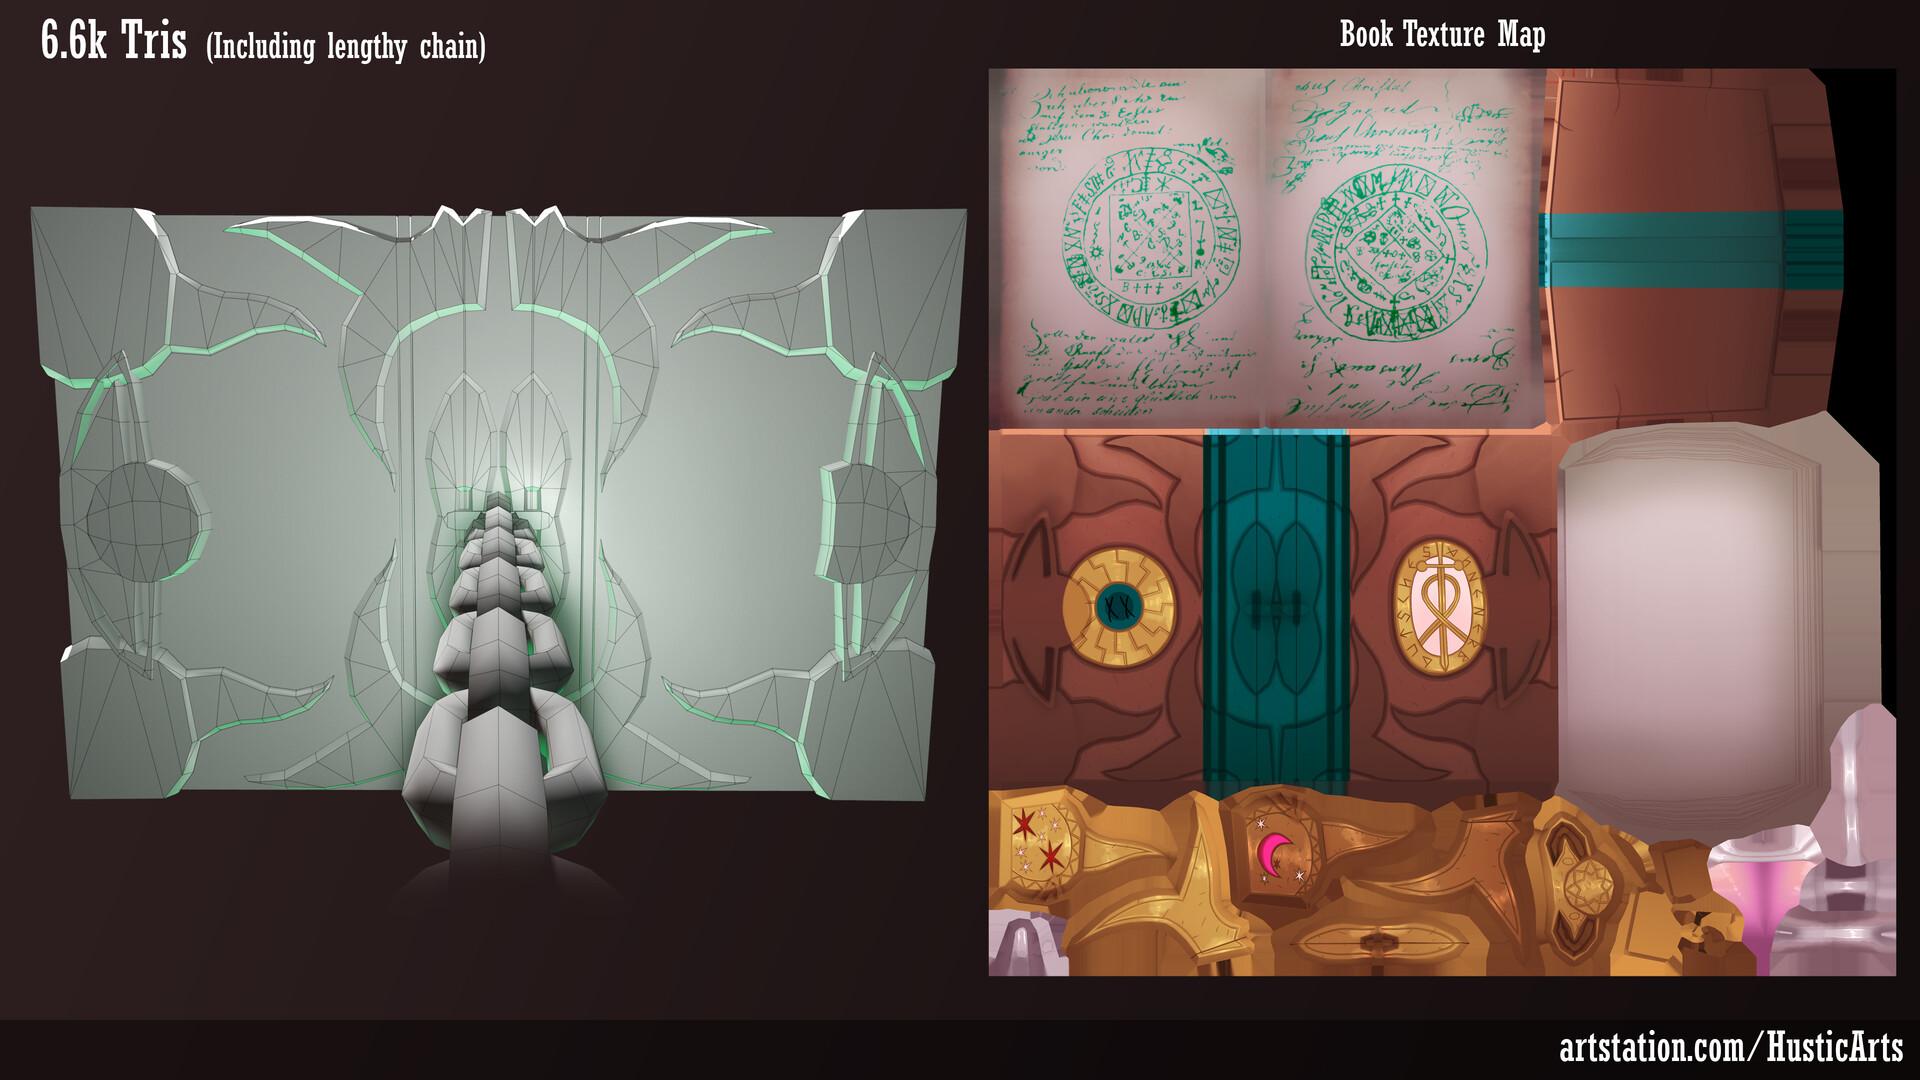 Book Topology/Texture